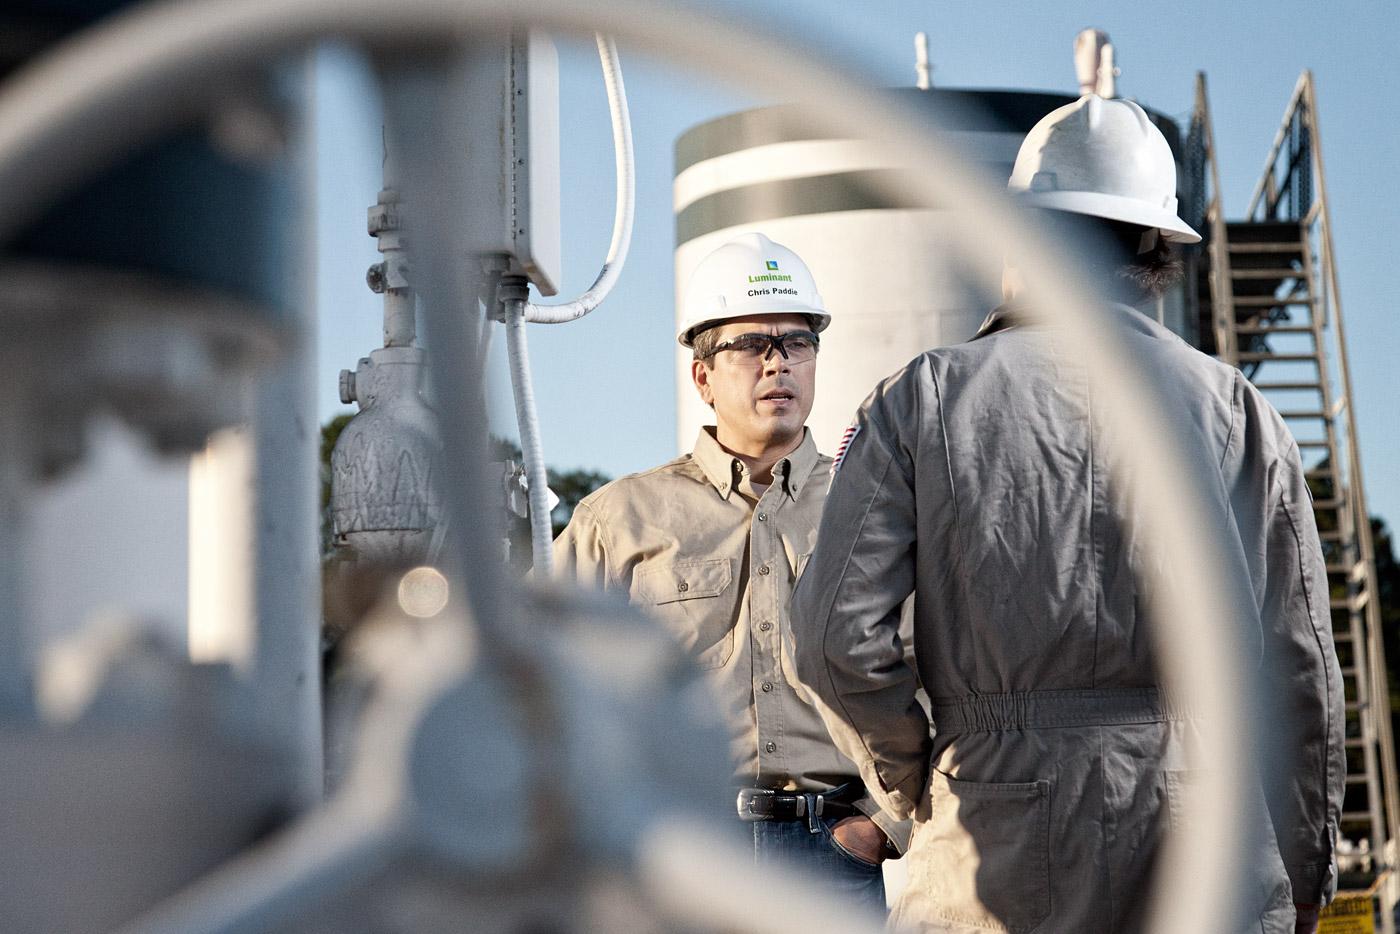 Editorial-ABP-Chris-Paddie-Natural-Gas-Well1.jpg